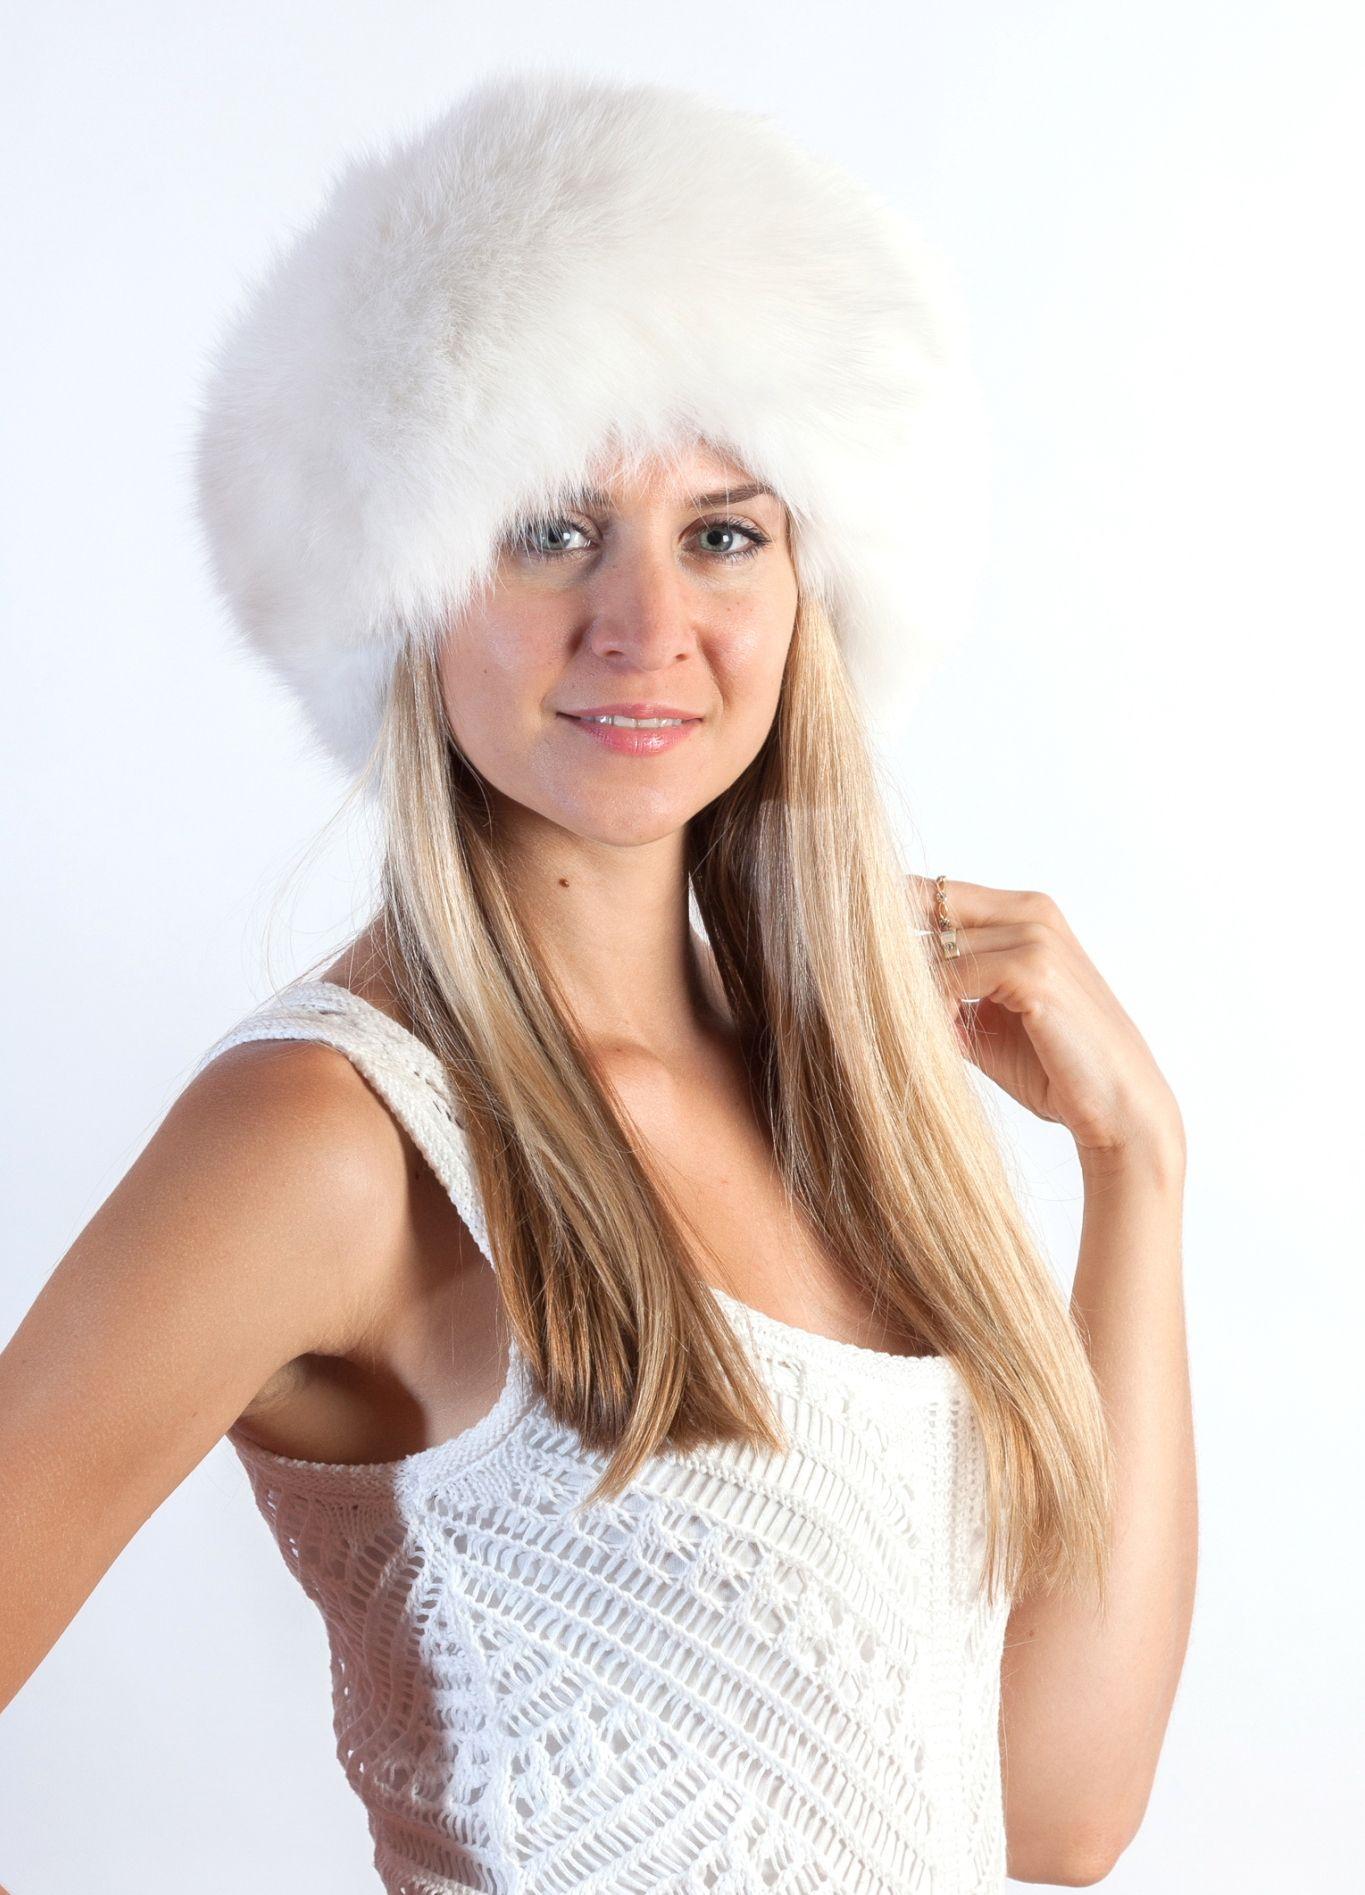 Elegante e soffice fascia scaldafronte-scaldacollo in volpe bianca naturale 09ee5cc7ee82